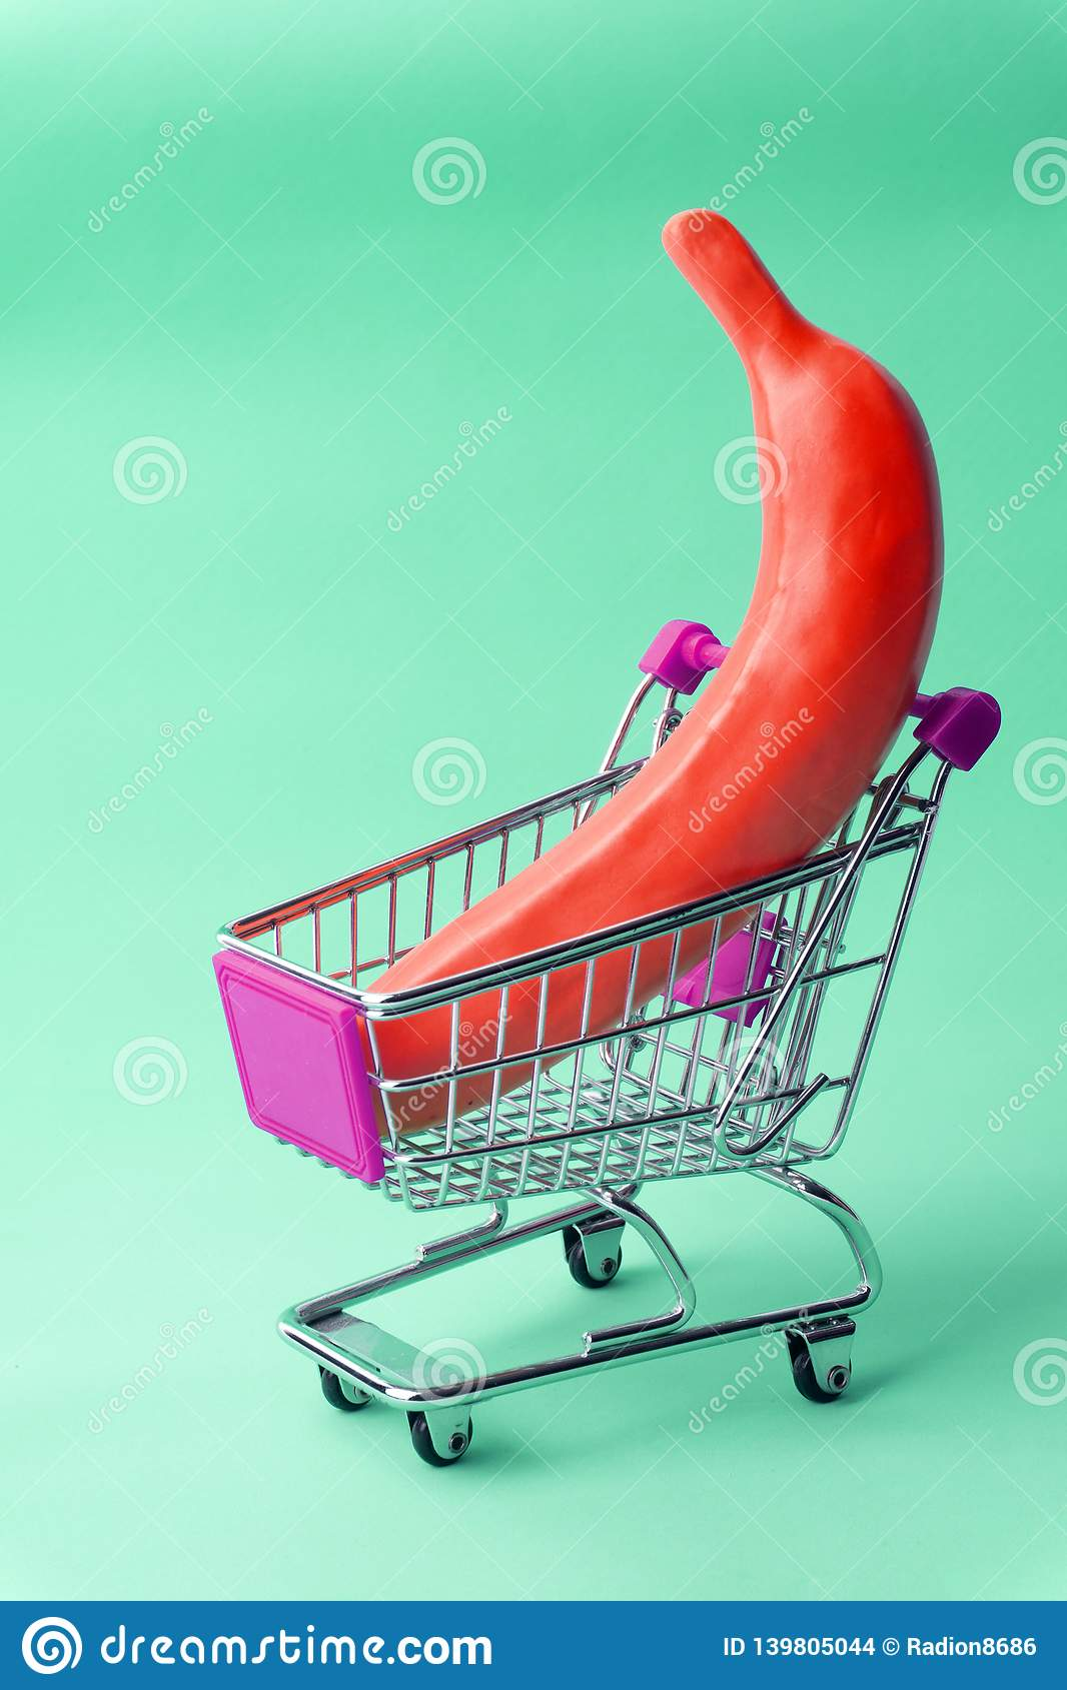 Shopping minimal concept. Banana in a toy shopping cart. Minimal pop art background, contemporary art.